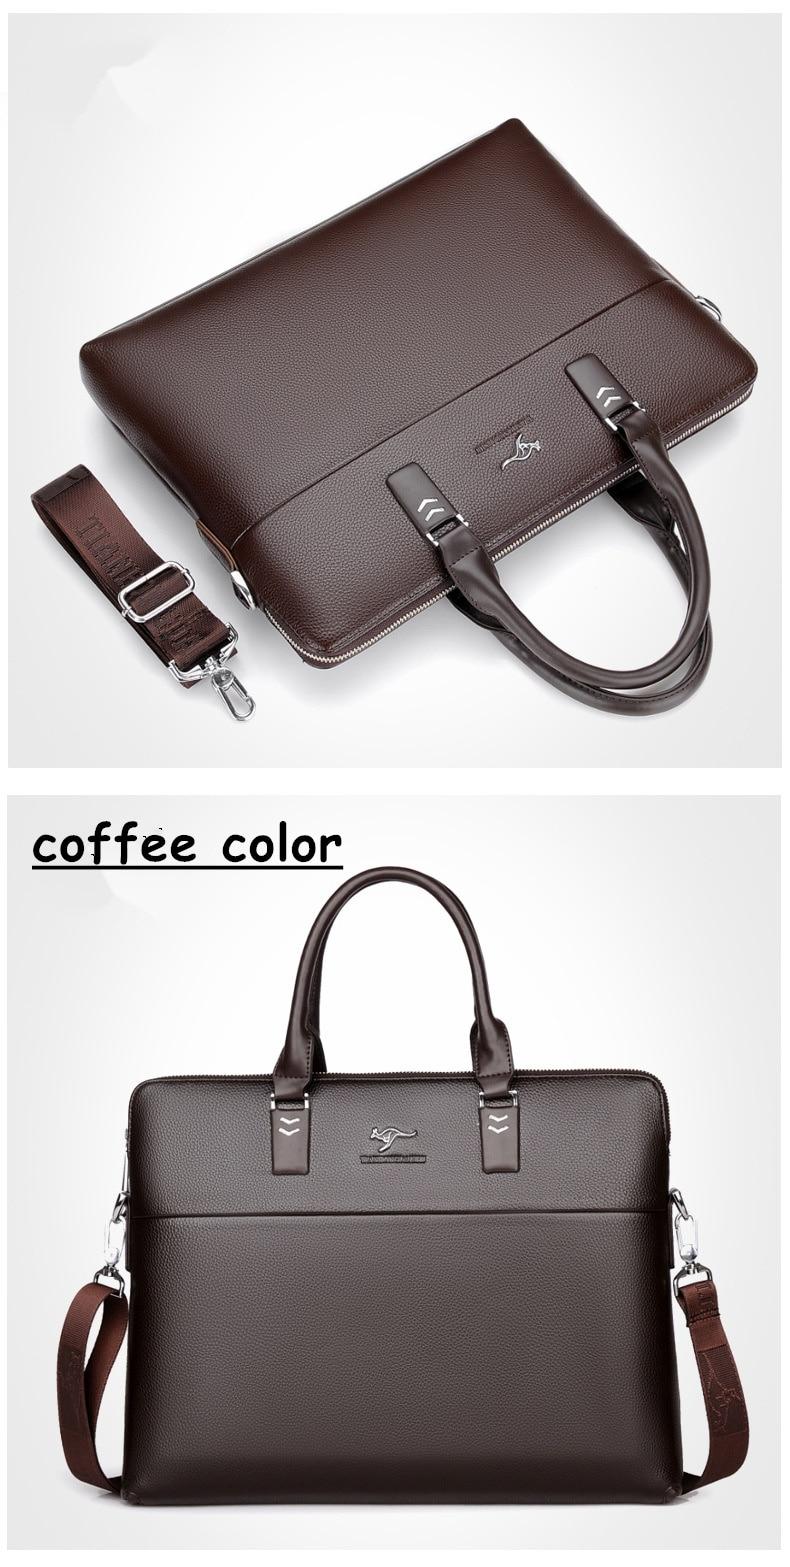 HTB1Bf7vgpcJL1JjSZFOq6AWlXXaa TIANHONGDAISHU Men Casual Briefcase Business Shoulder Leather Messenger Bags Computer Laptop Handbag Men's Travel Bags handbags